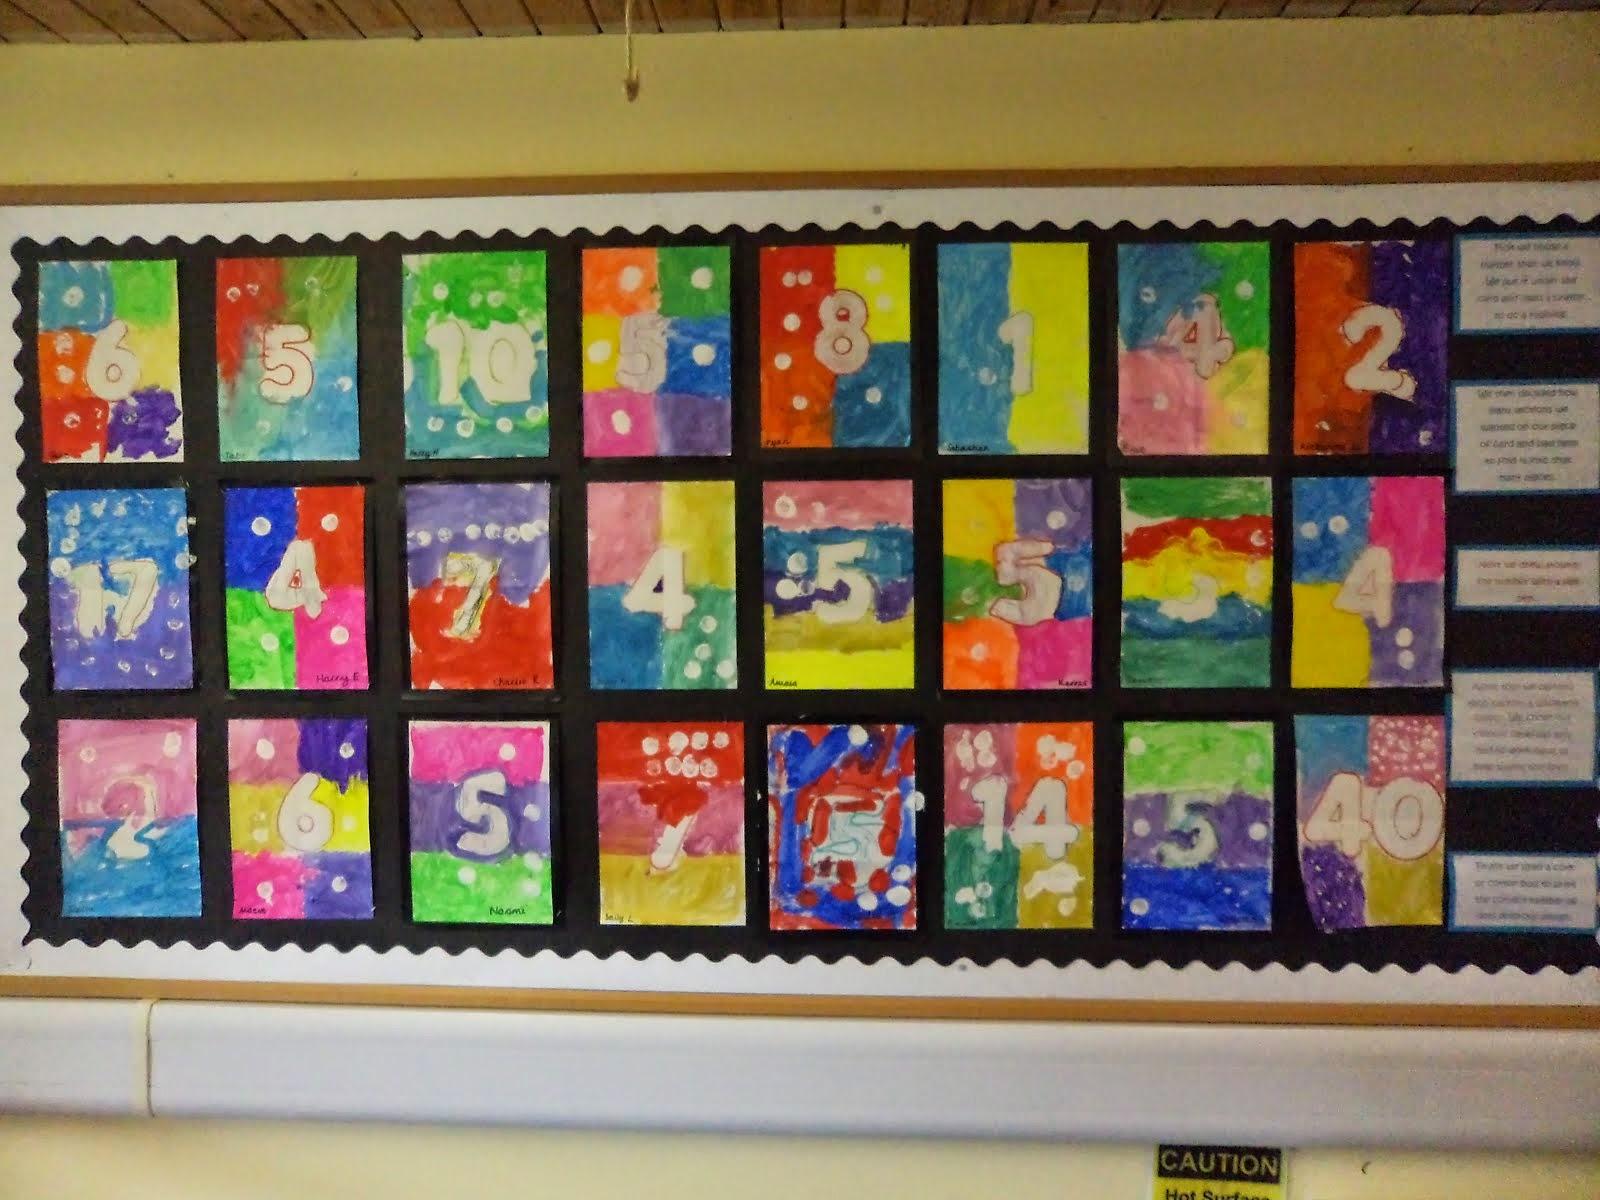 watlington primary school foundation stage maths and art